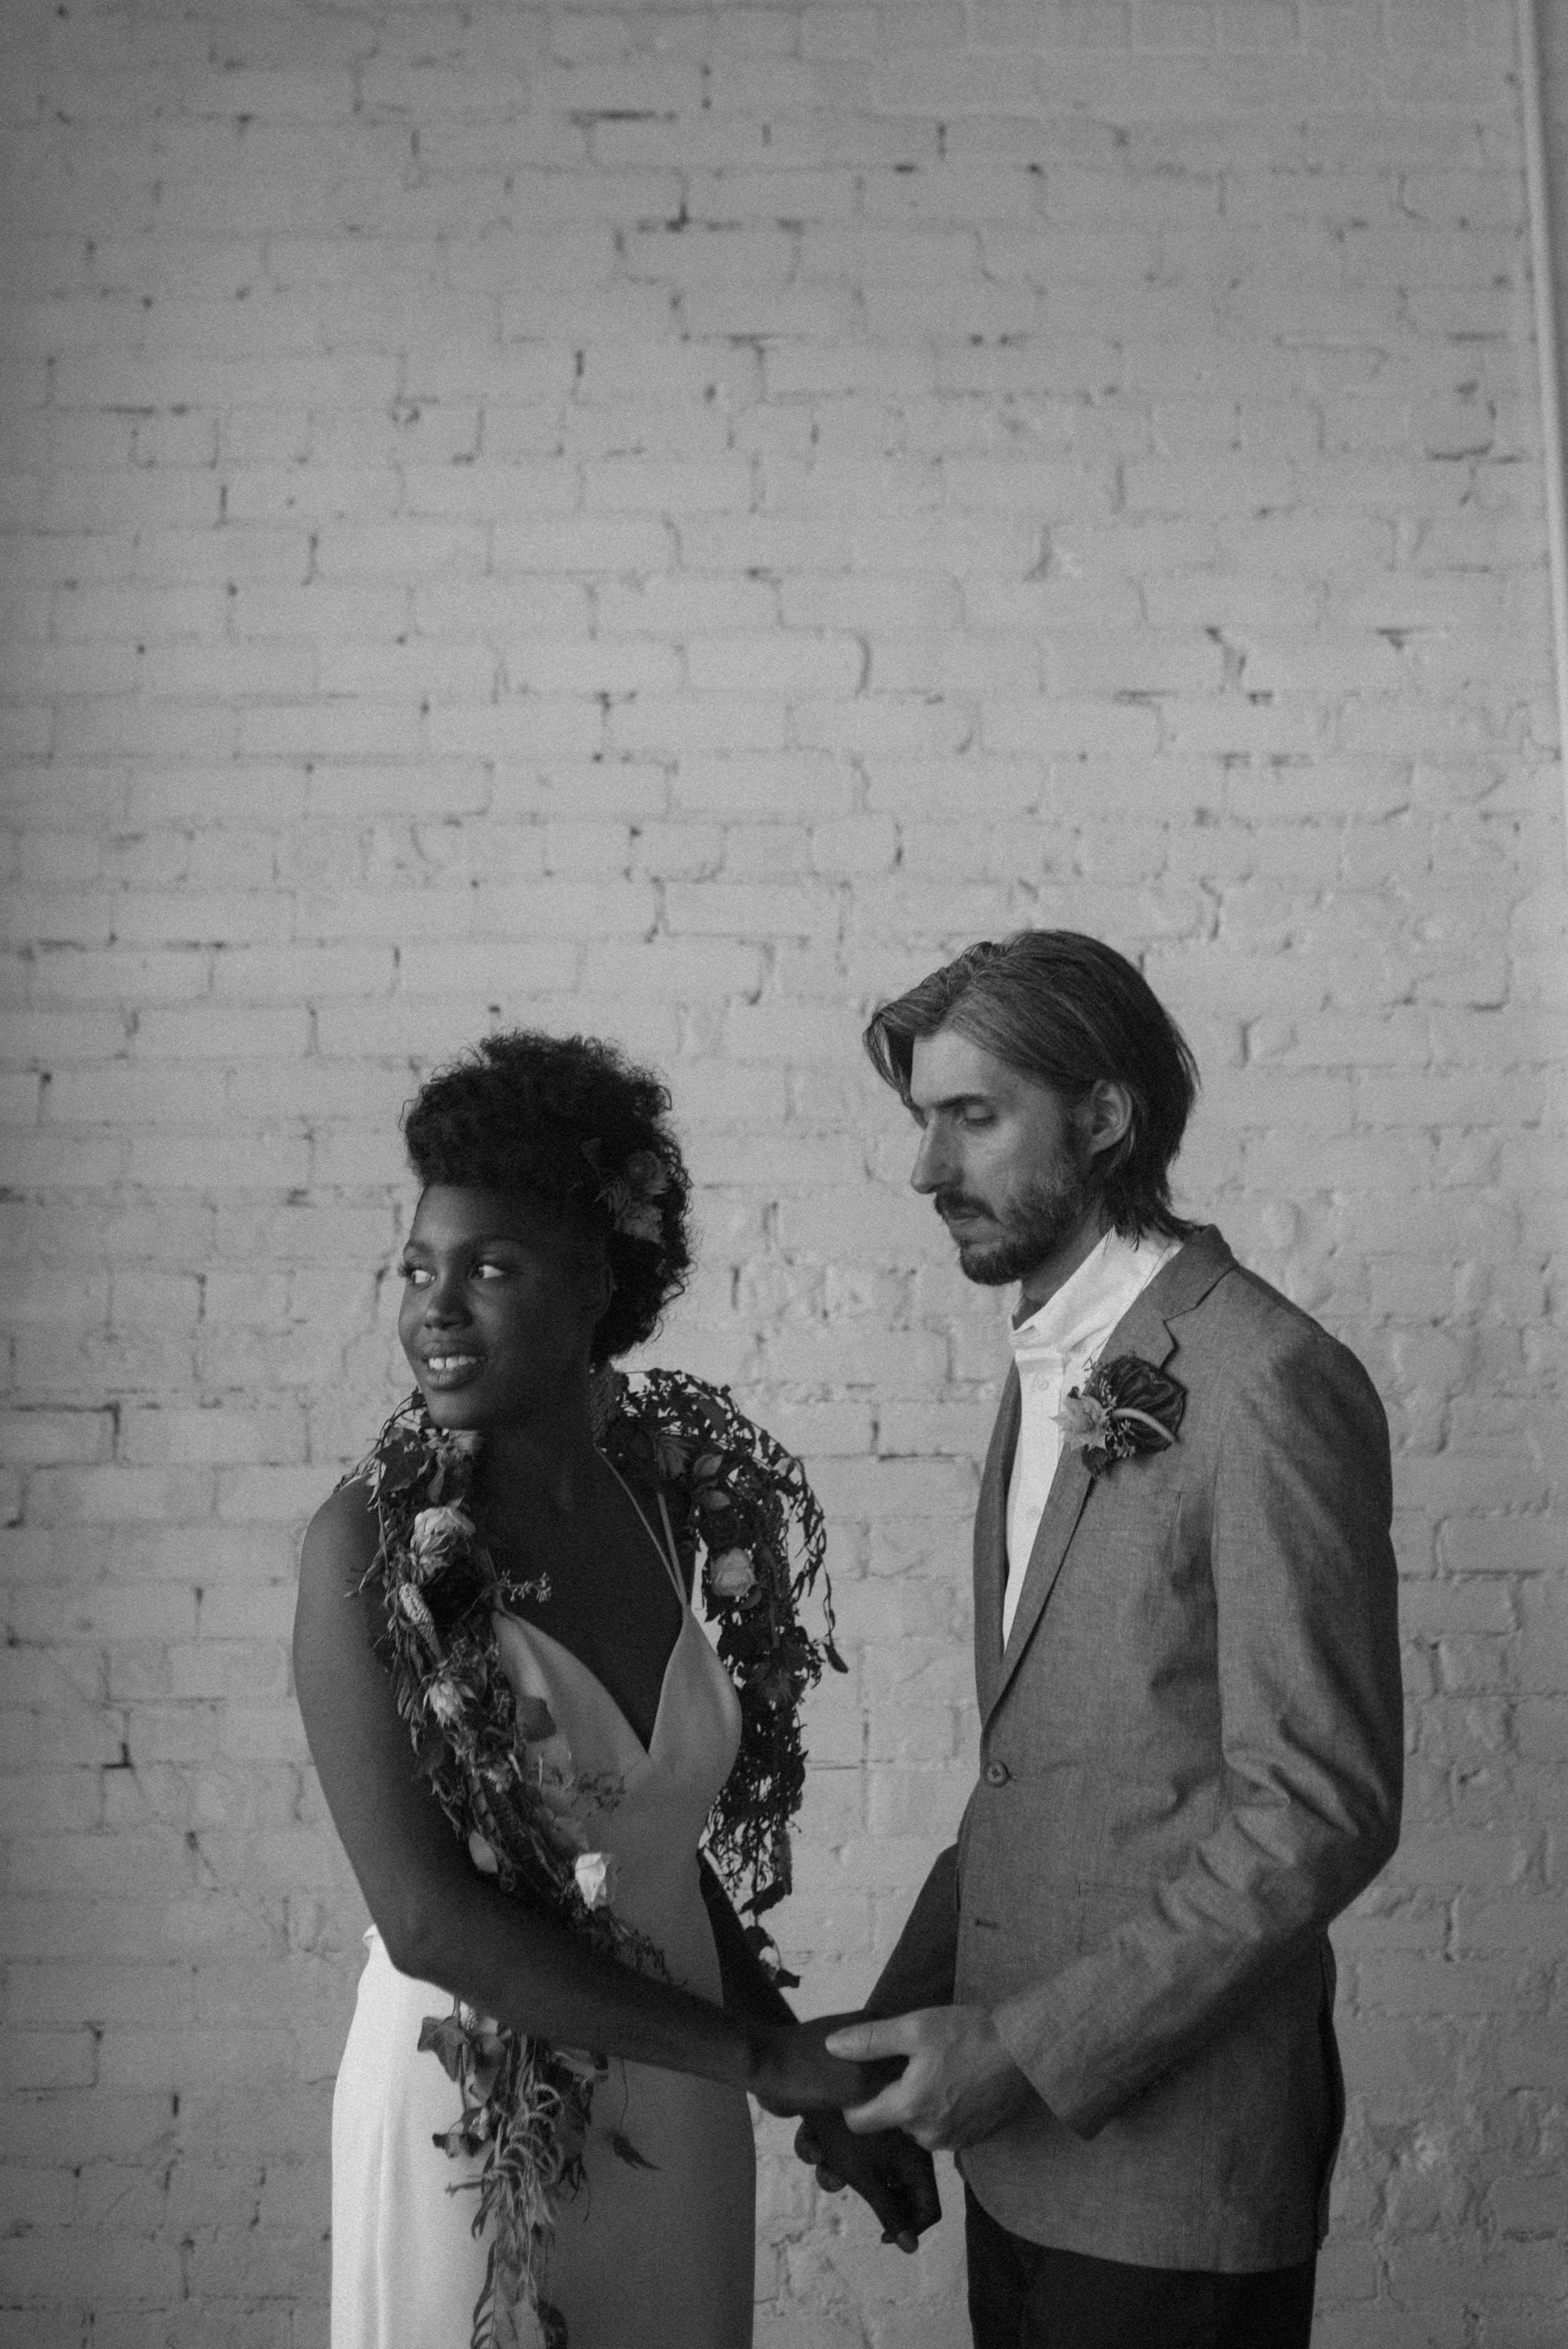 haus-820-minimal-editorial-wedding-styled-shoot-59.jpg